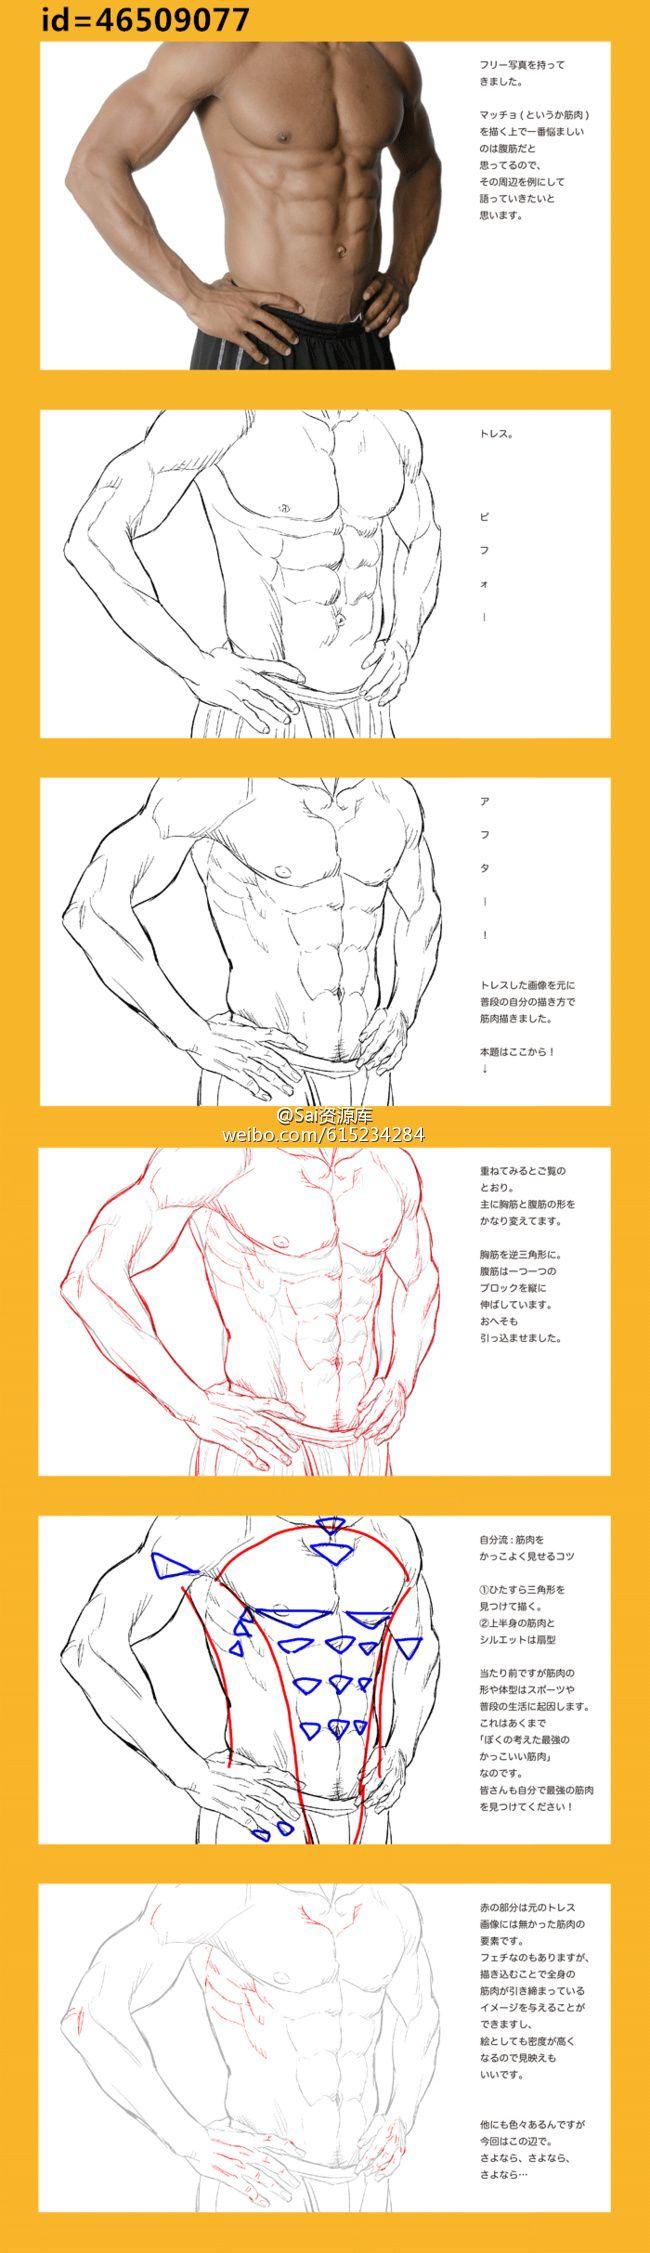 111 best Torso anatomy images on Pinterest | Human anatomy, Human ...